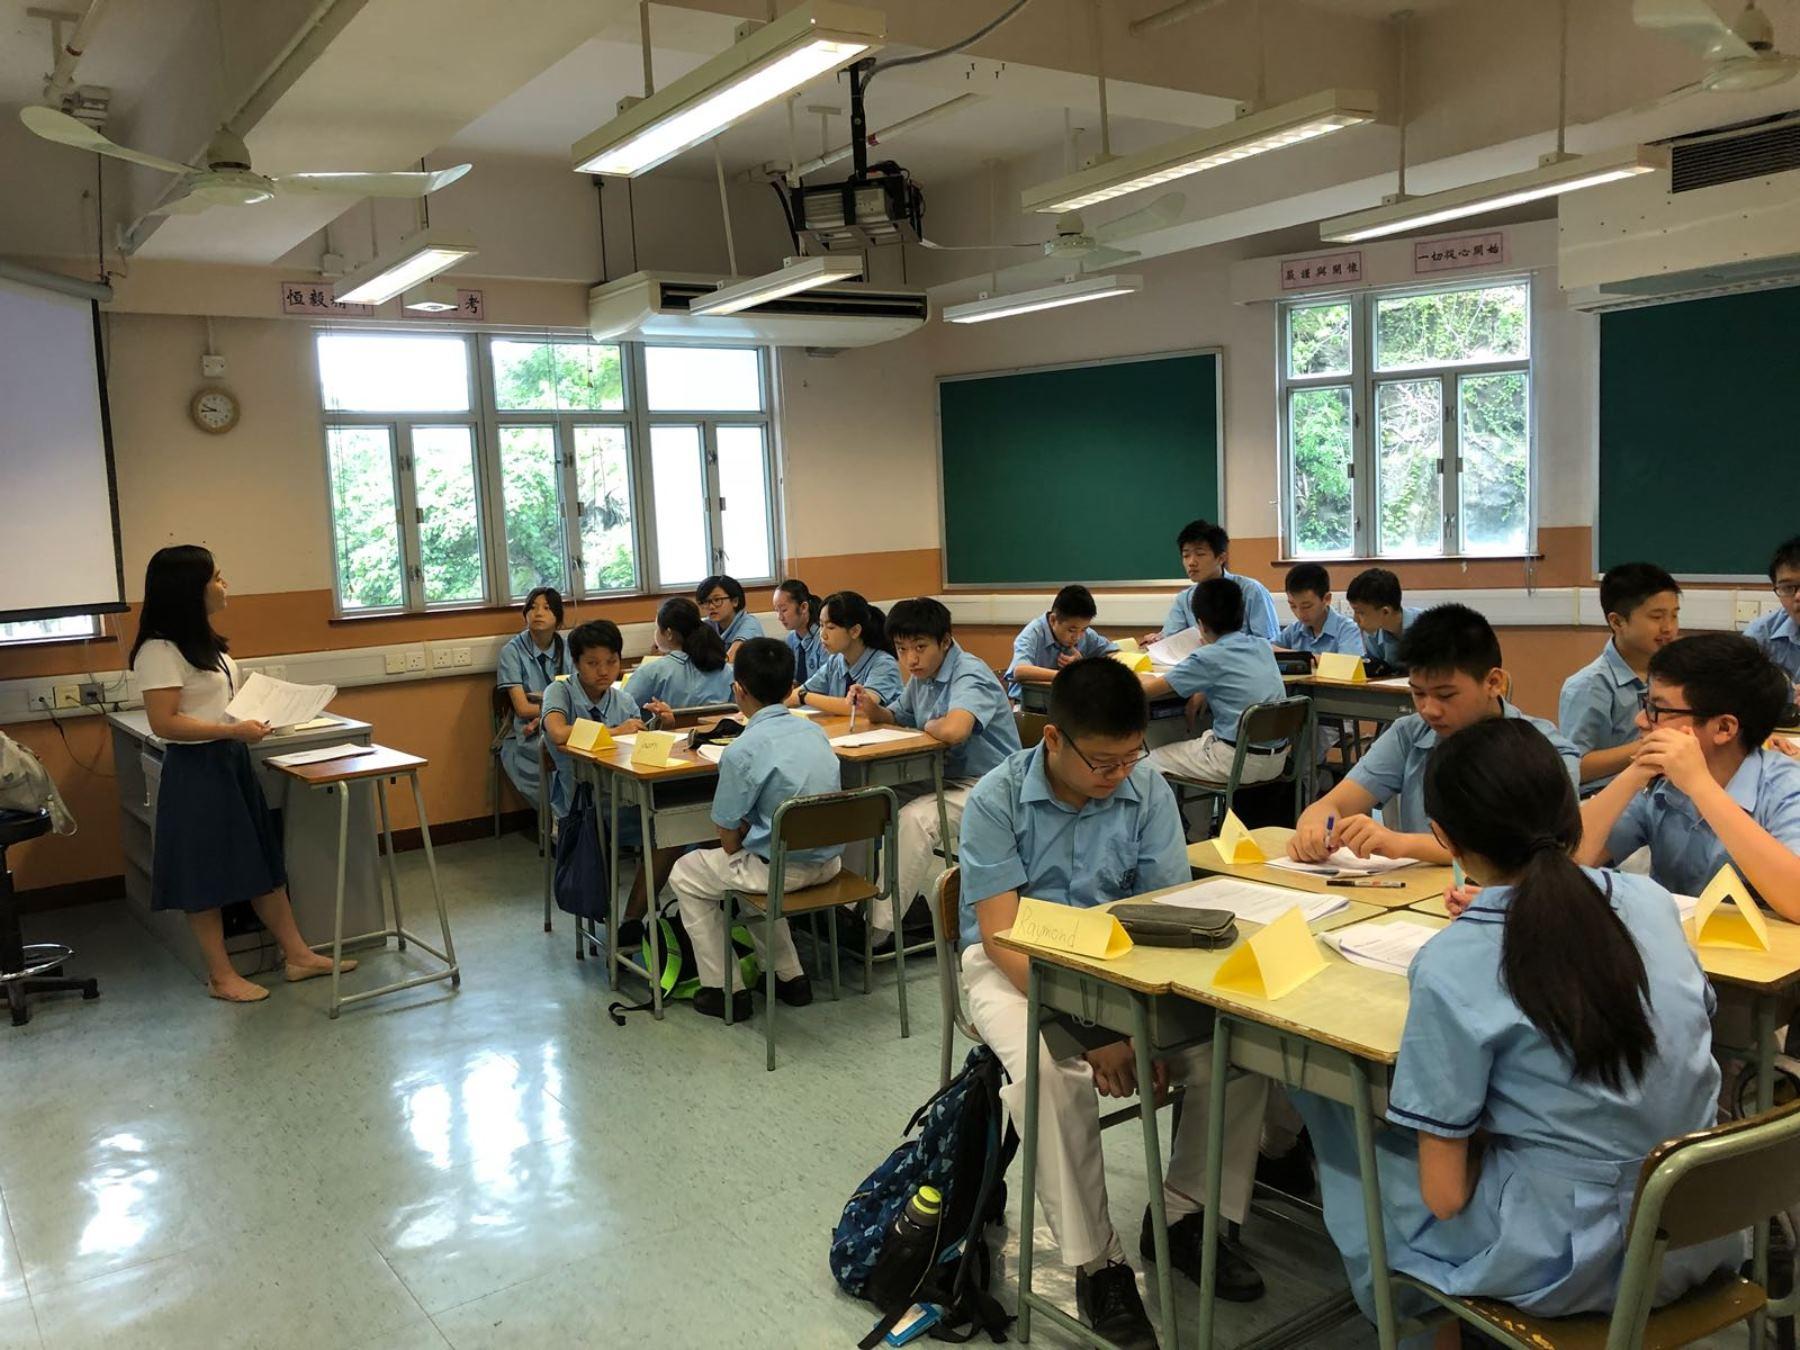 http://npc.edu.hk/sites/default/files/1_16.jpeg